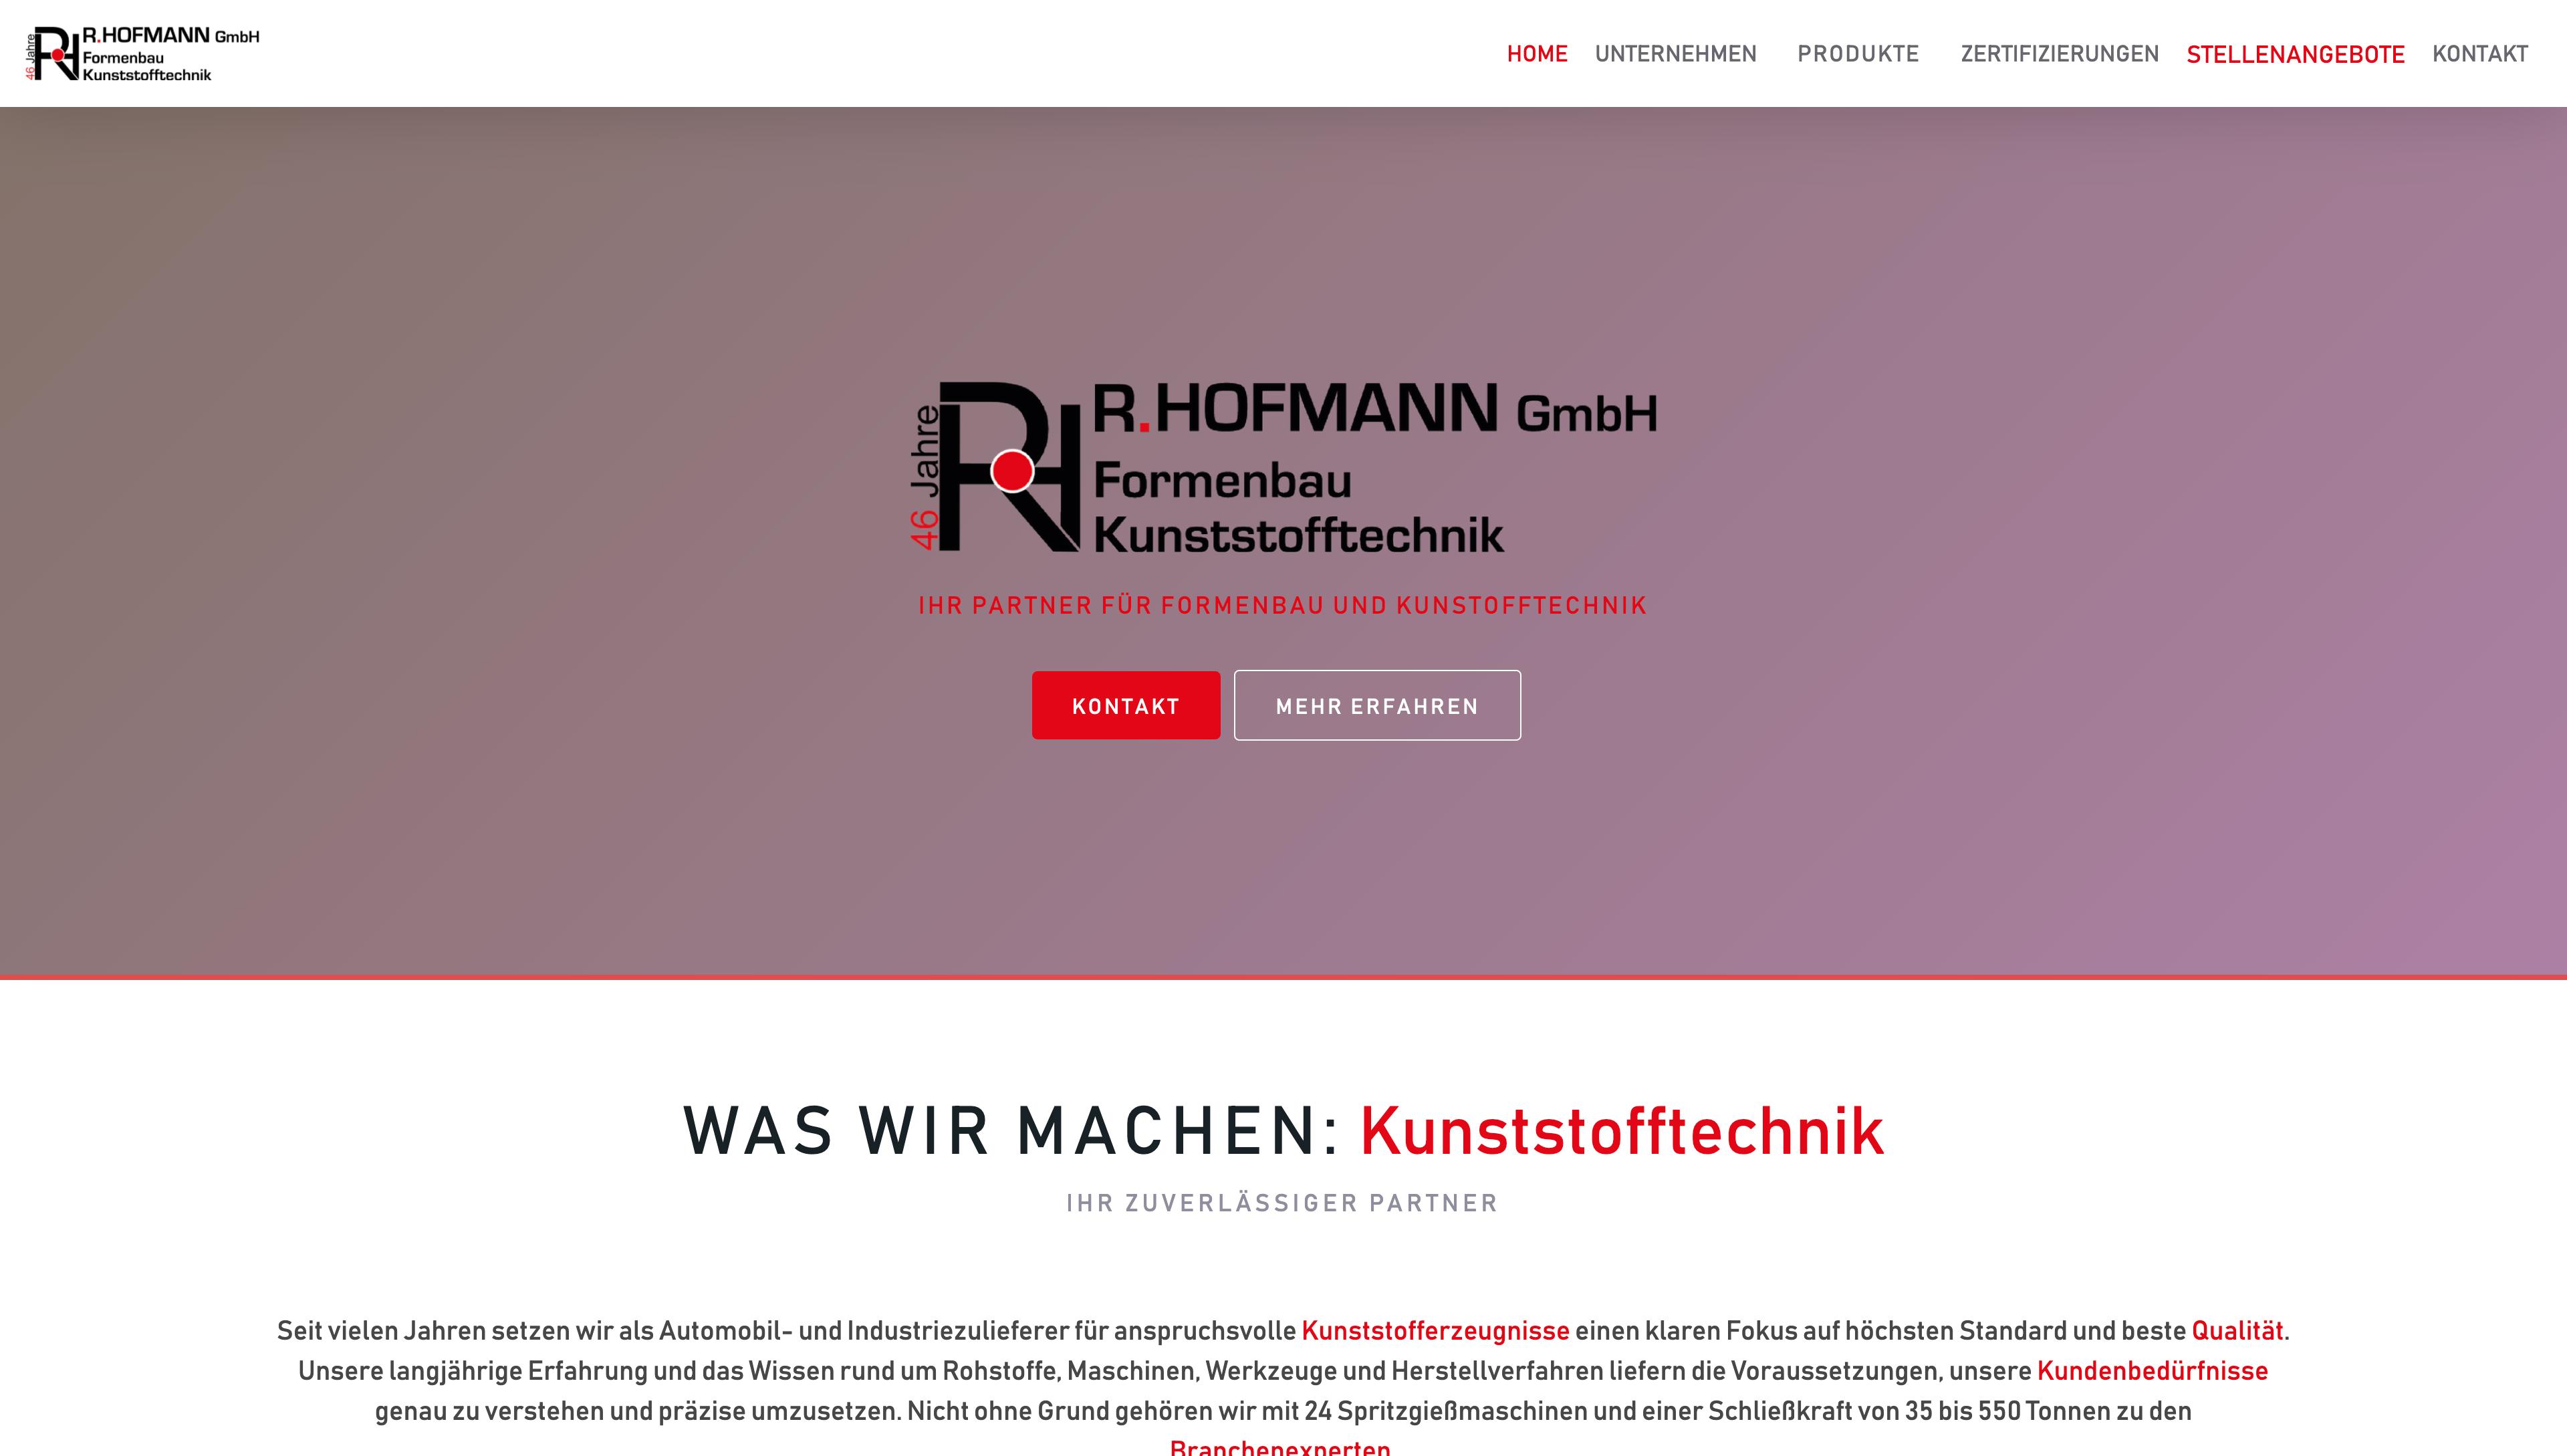 R. Hofmann GmbH